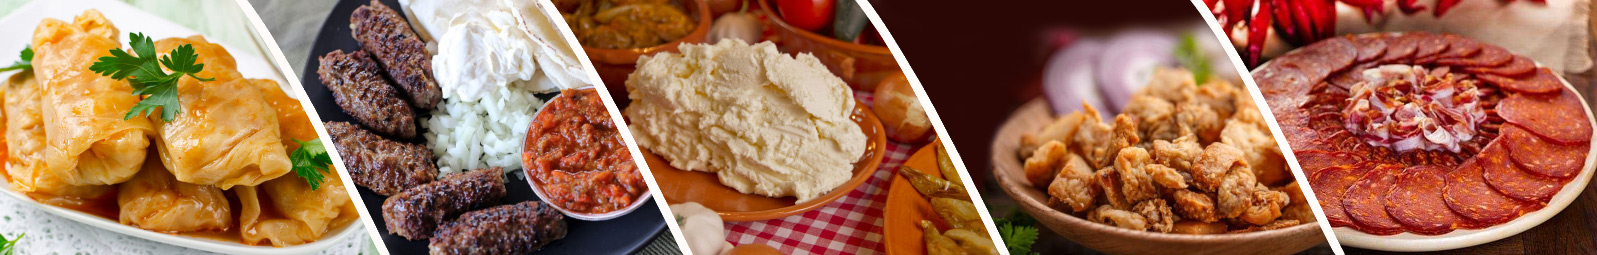 Traditional Serbian food